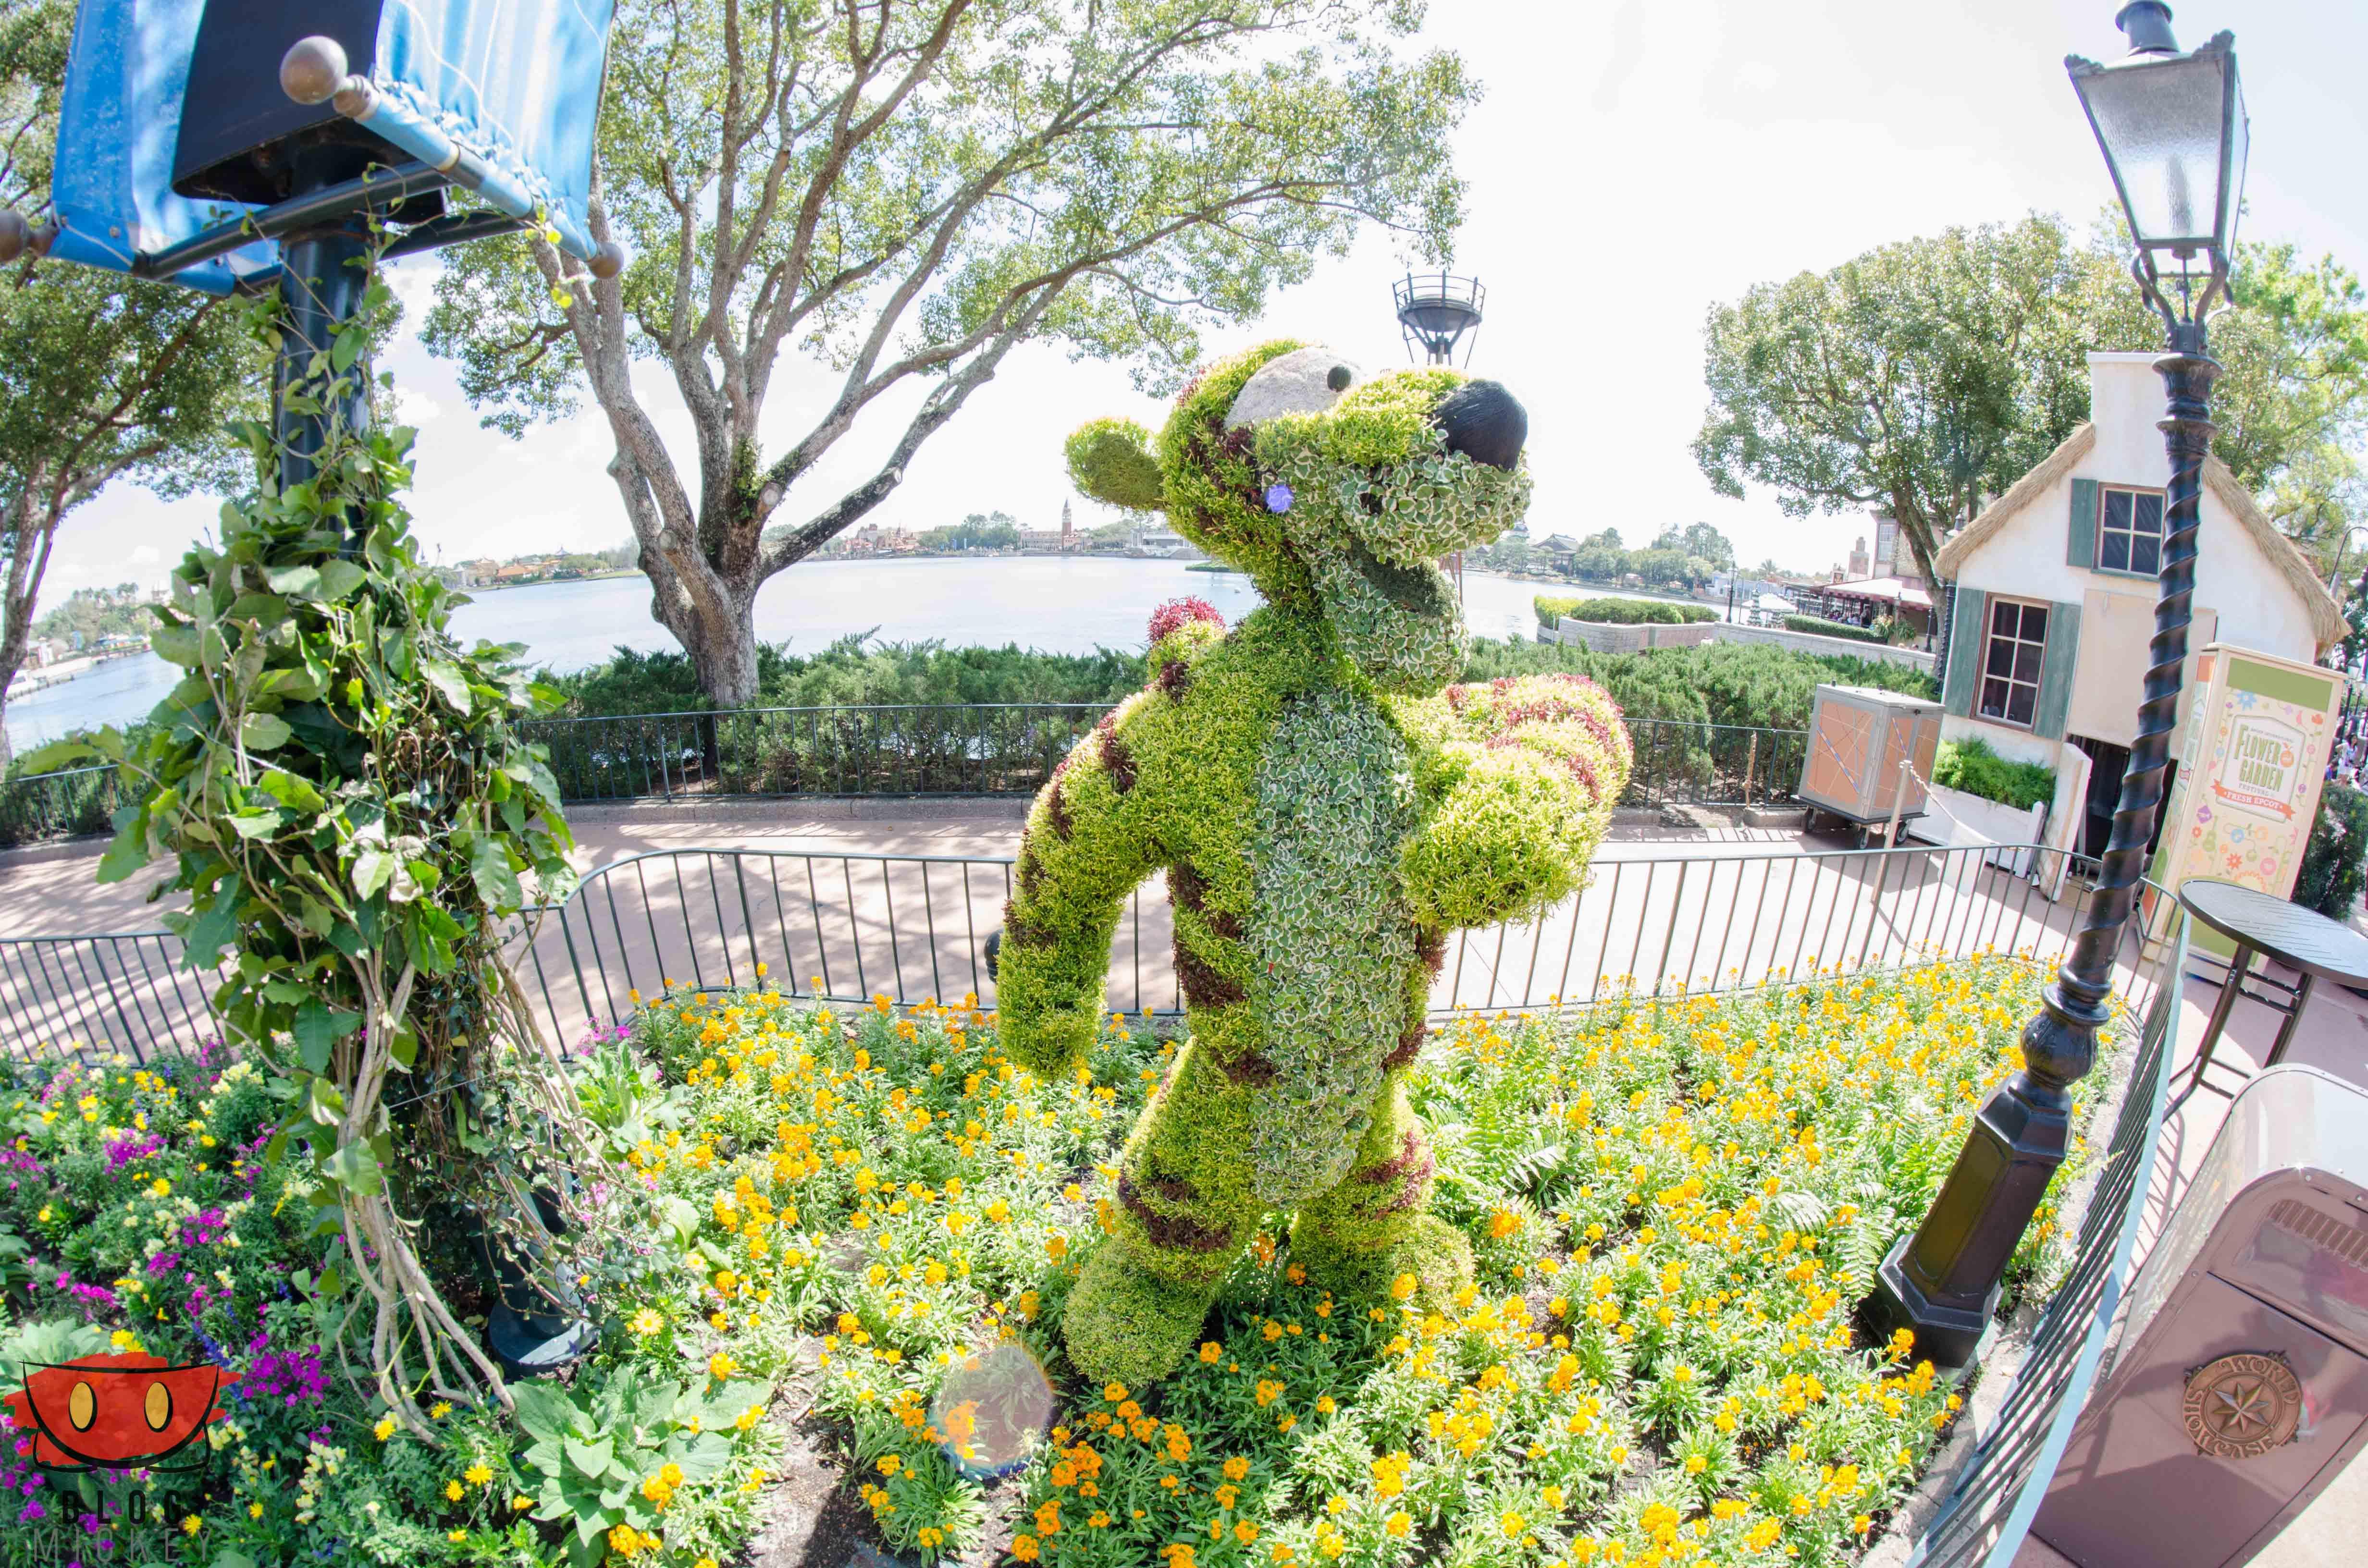 FlowerAndGardenTopiaries_03012016-47